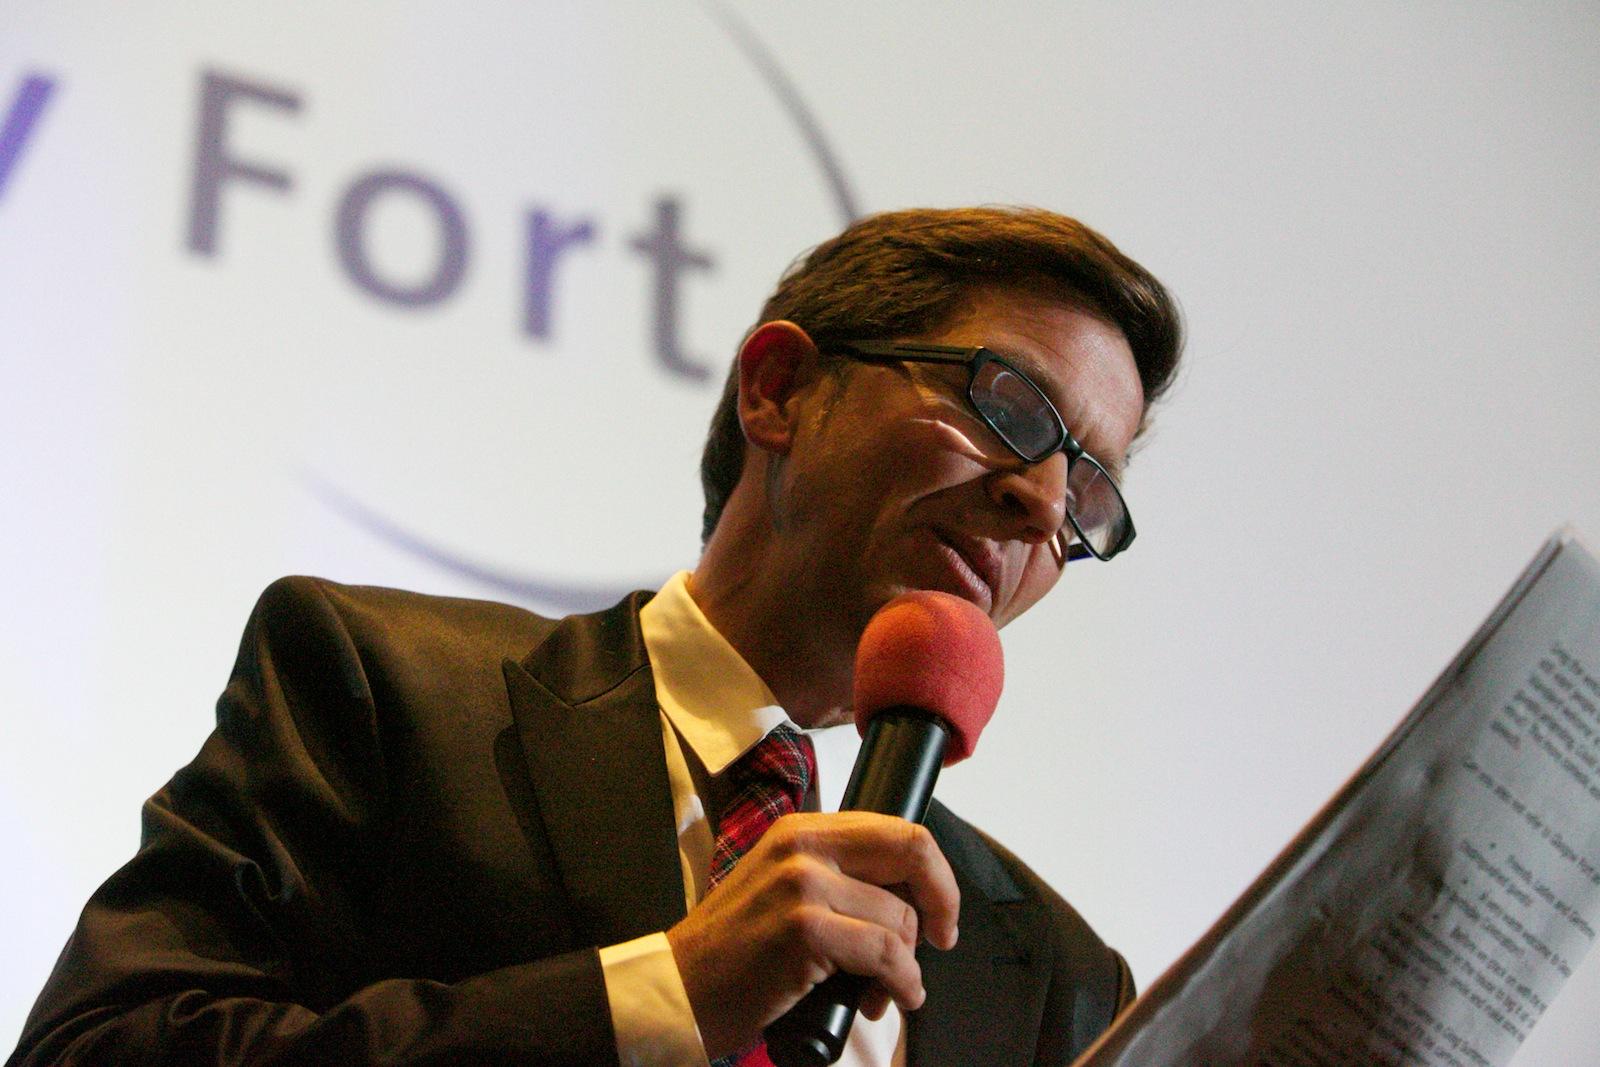 Awards Presenter Glasgow Fort